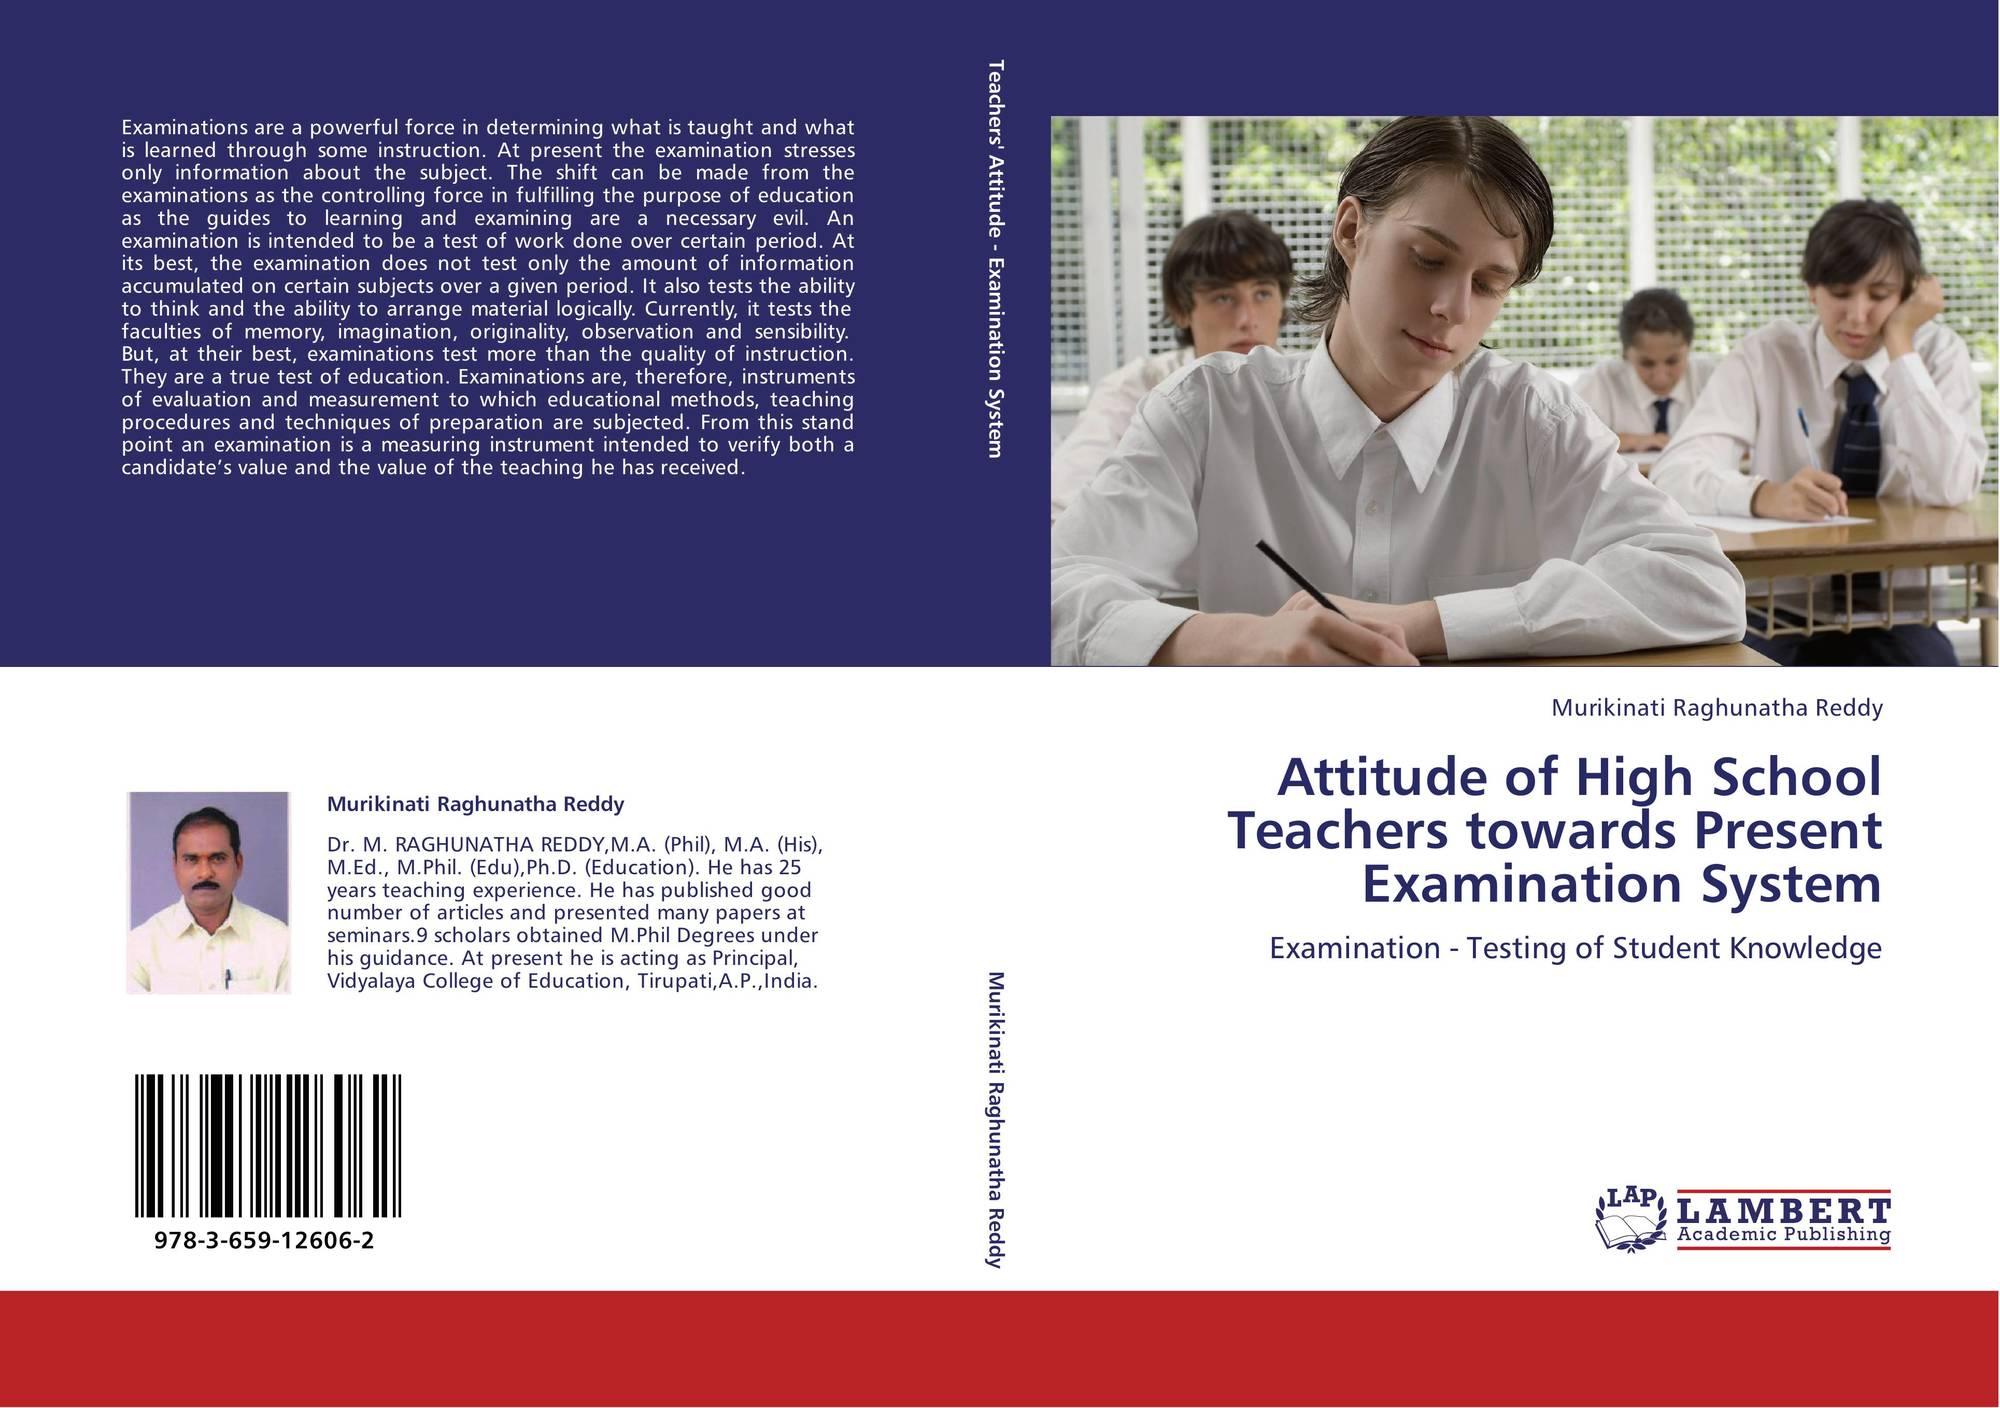 essay examination system essay topics essay examination system research paper writing service